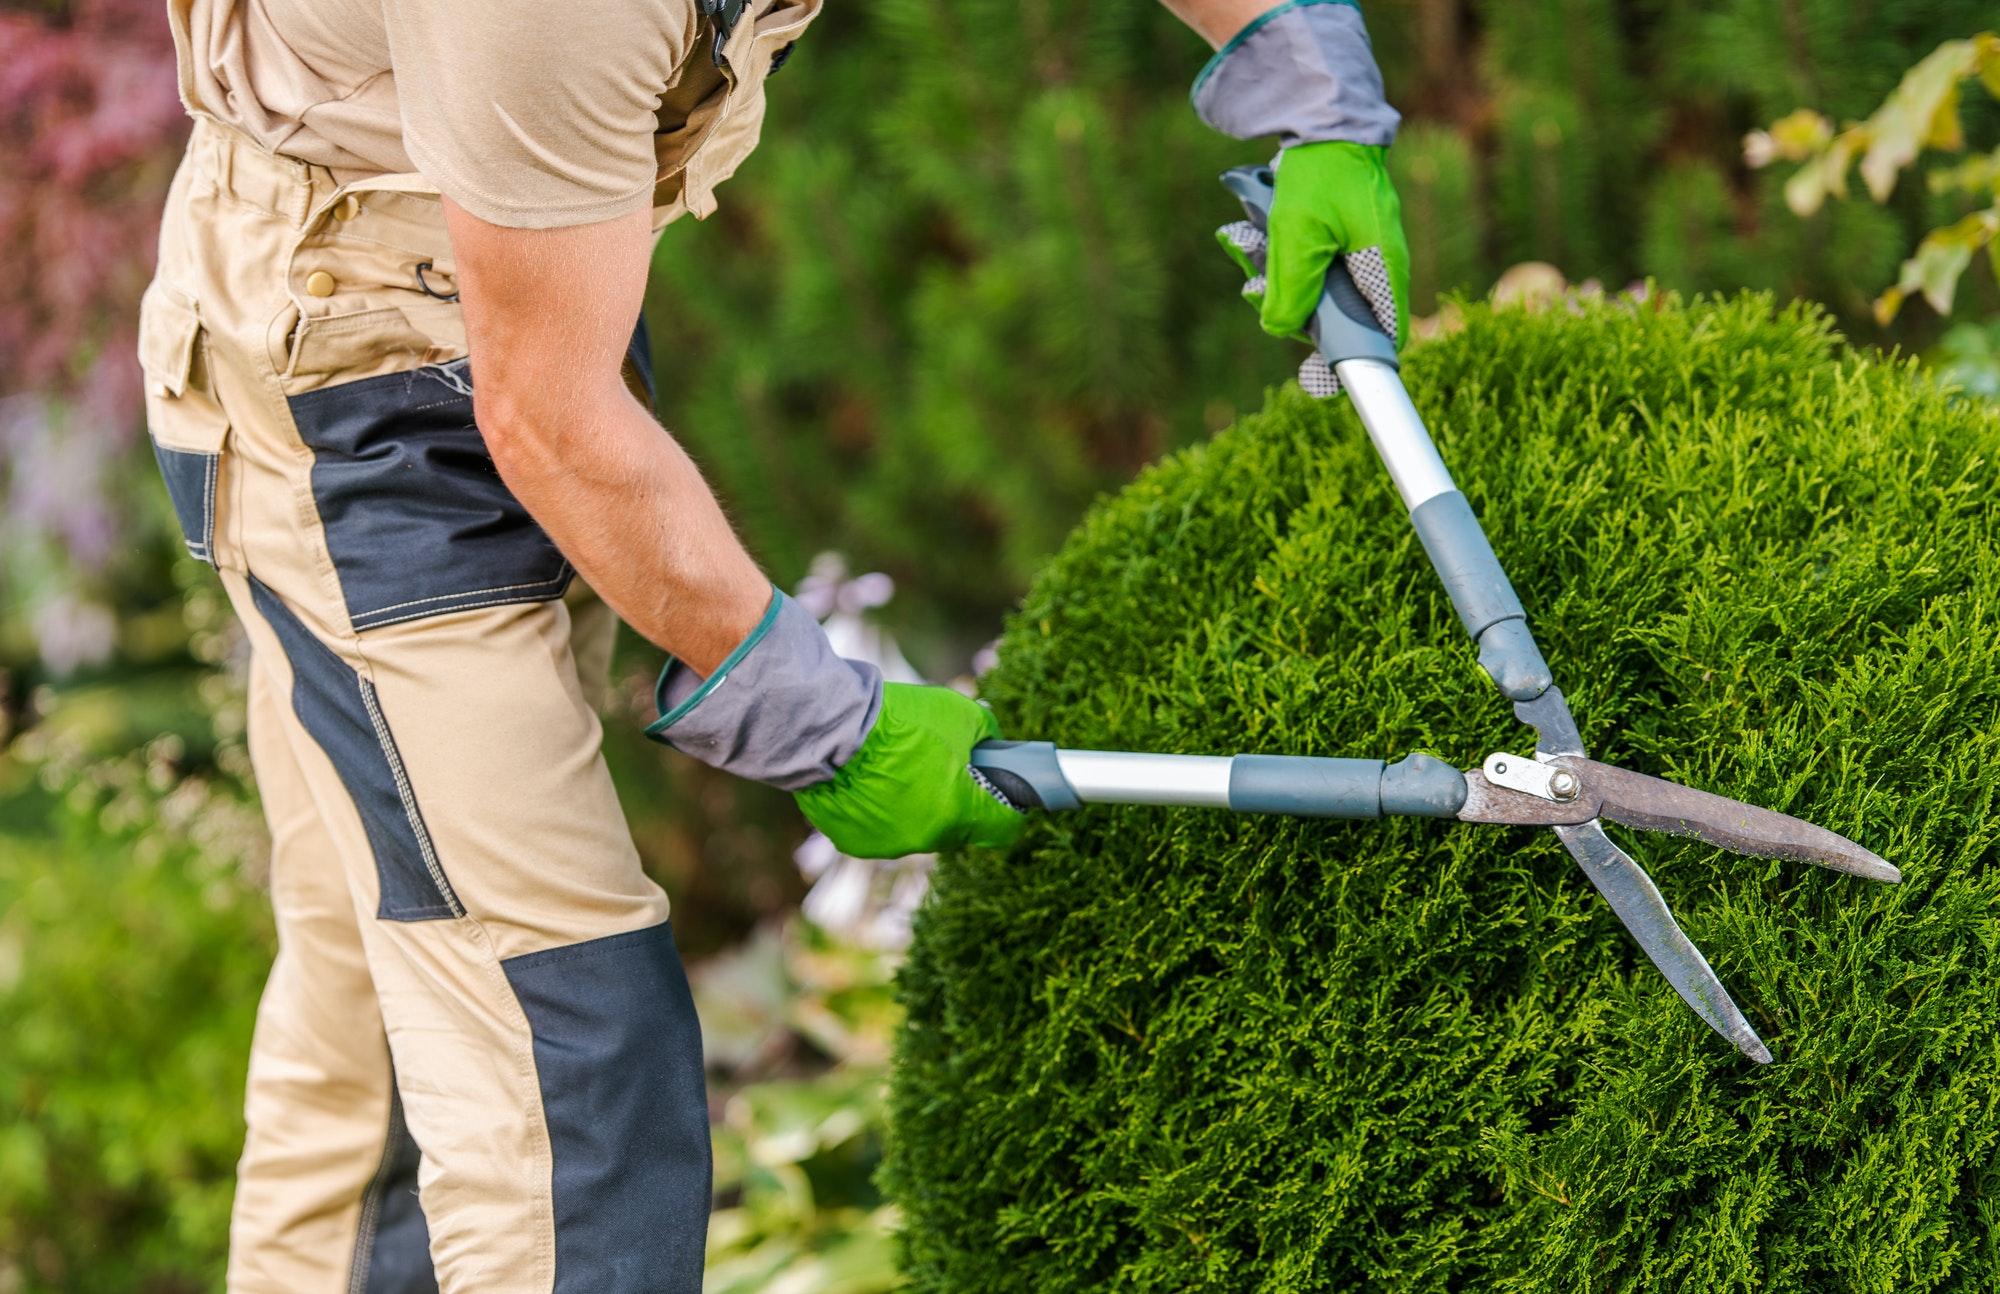 Gardener Pruning And Shaping Bushes.